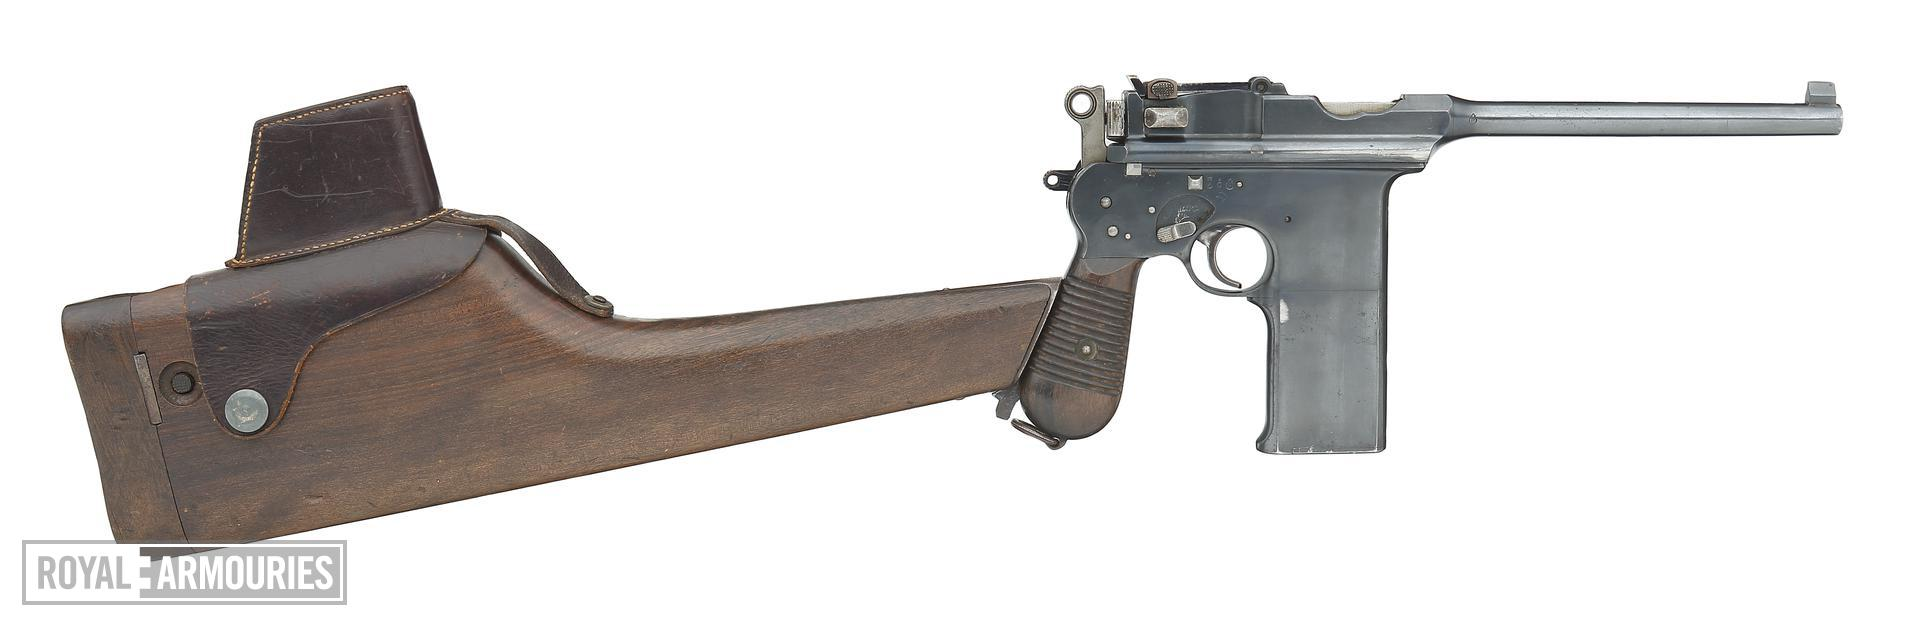 Centrefire automatic pistol - Astra M902